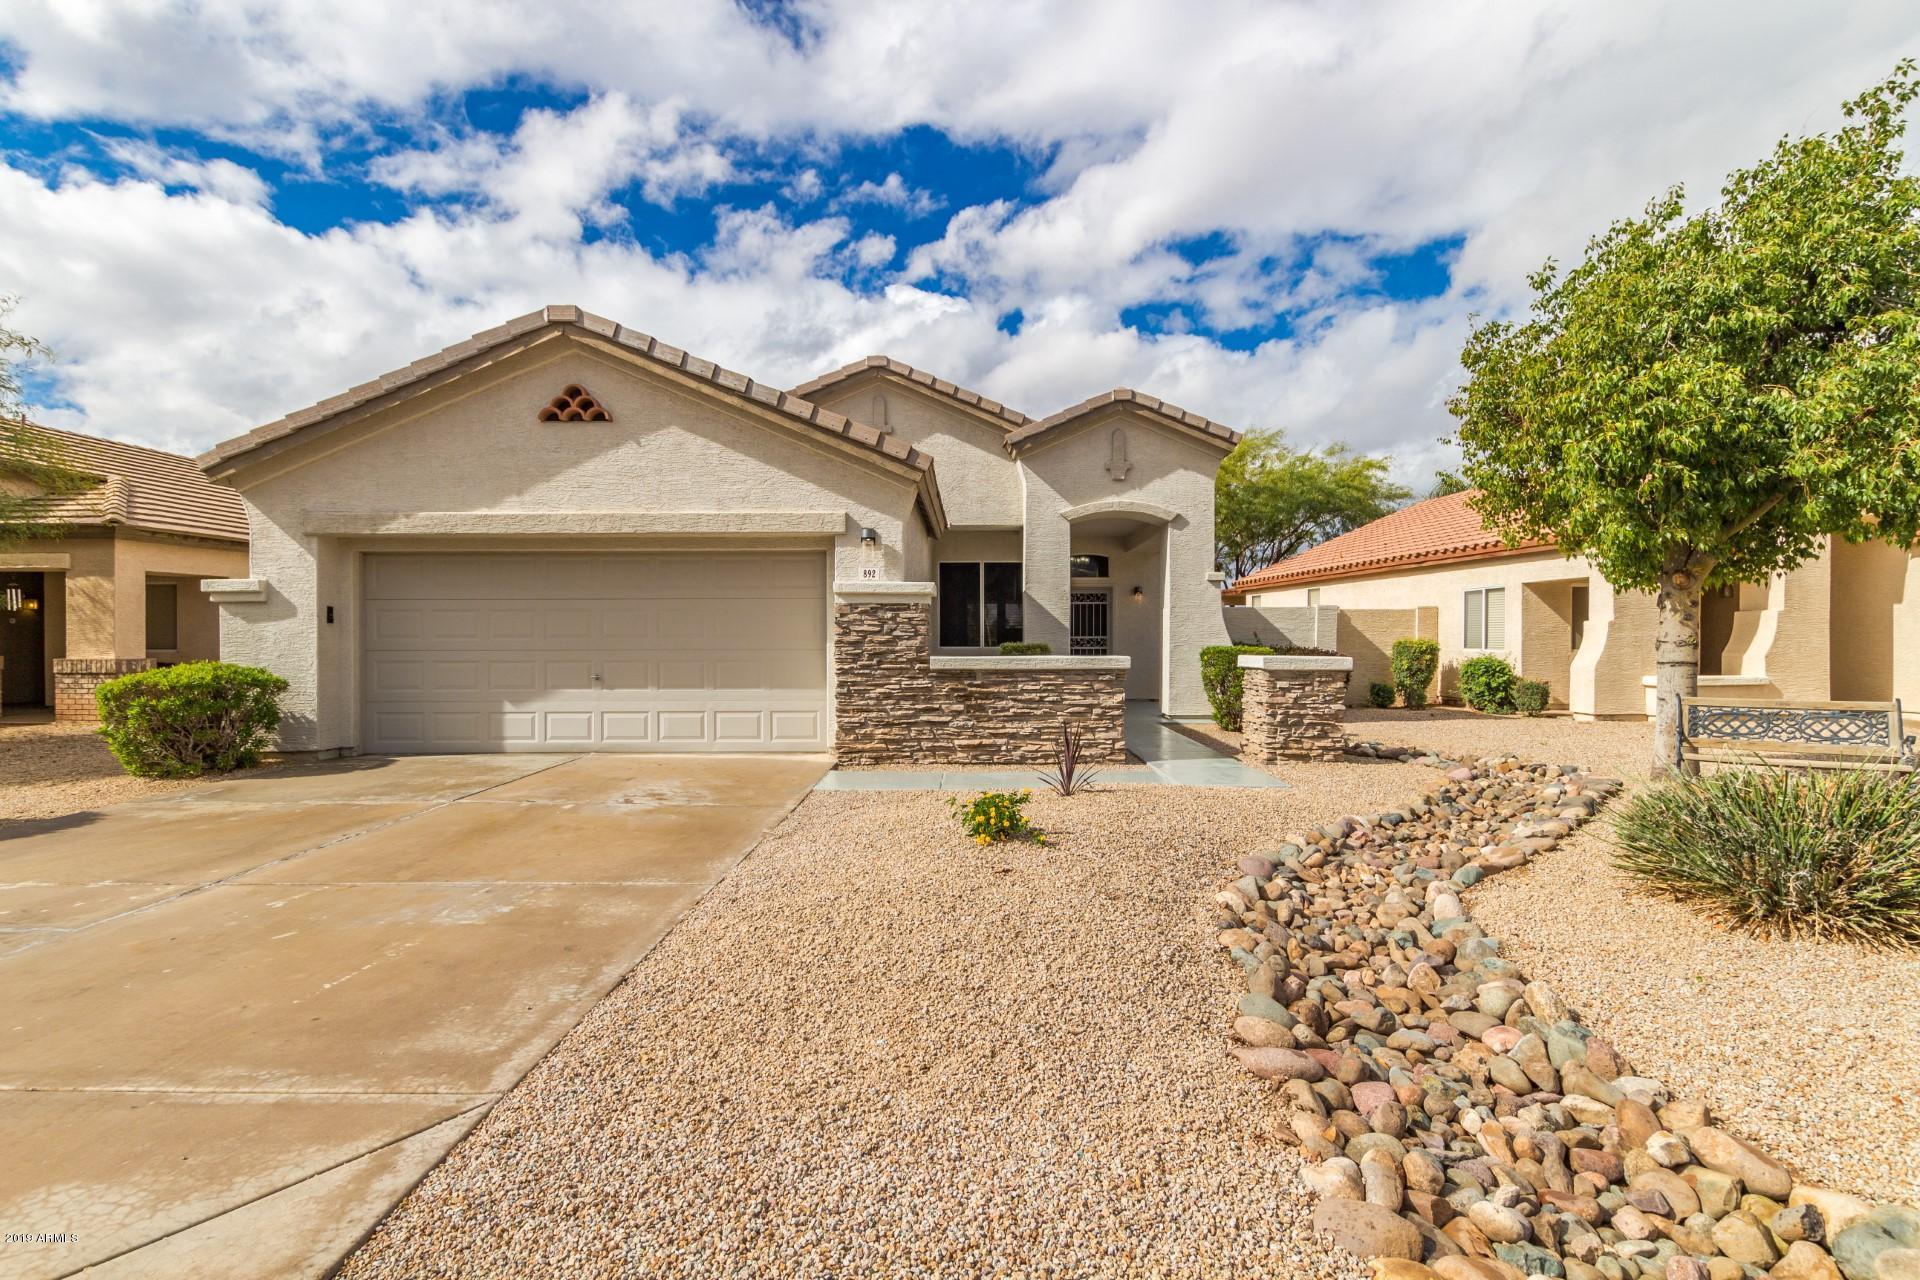 MLS 5879849 892 S ROANOKE Street, Gilbert, AZ Gilbert AZ Greenfield Lakes